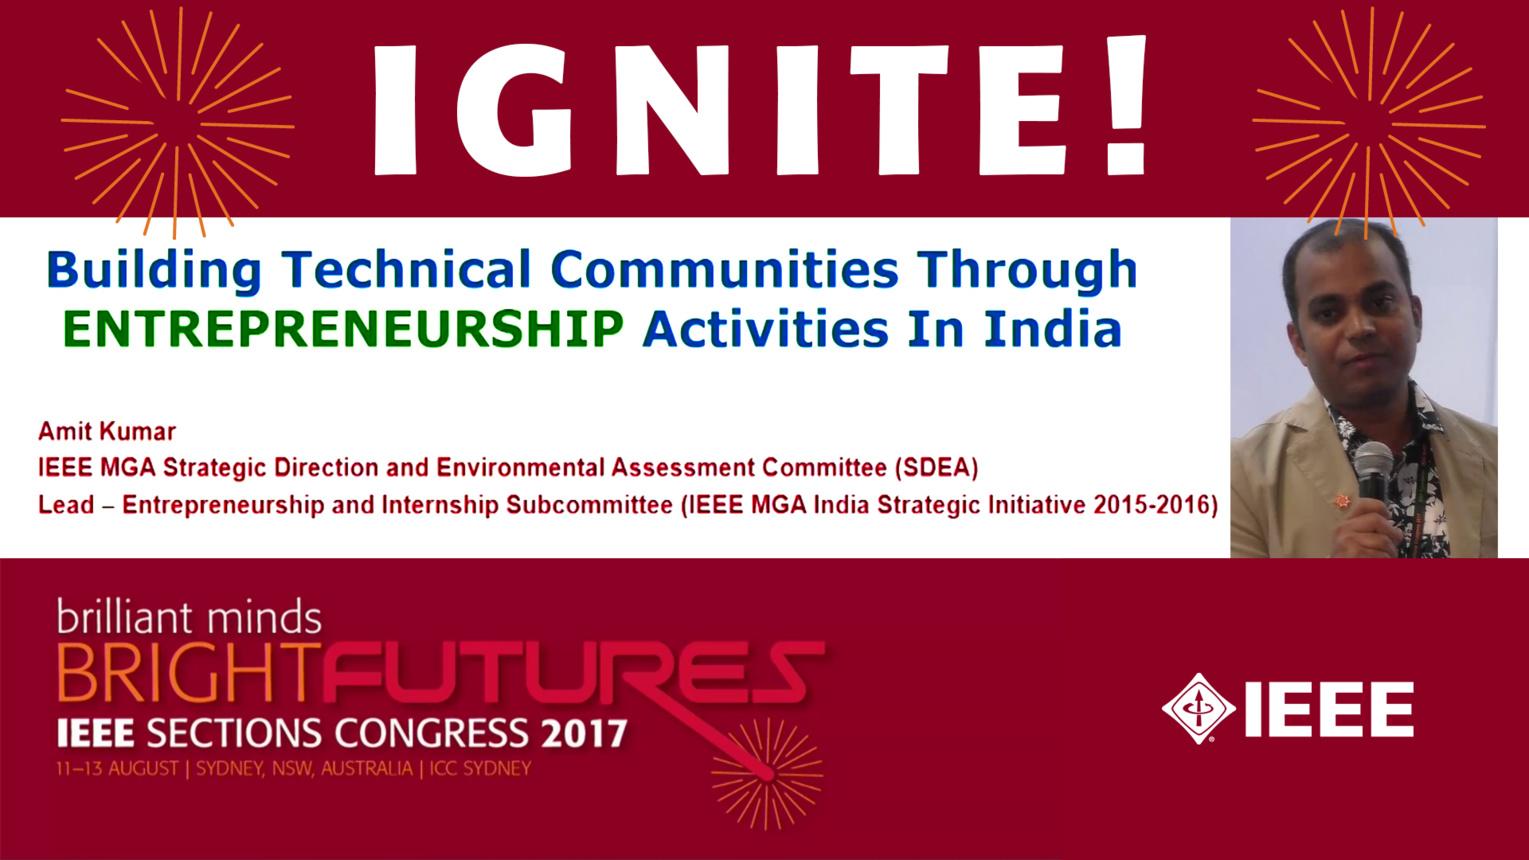 Building Technical Communities Through Entrepreneurship Activities in India - Amit Kumar - Ignite: Sections Congress 2017